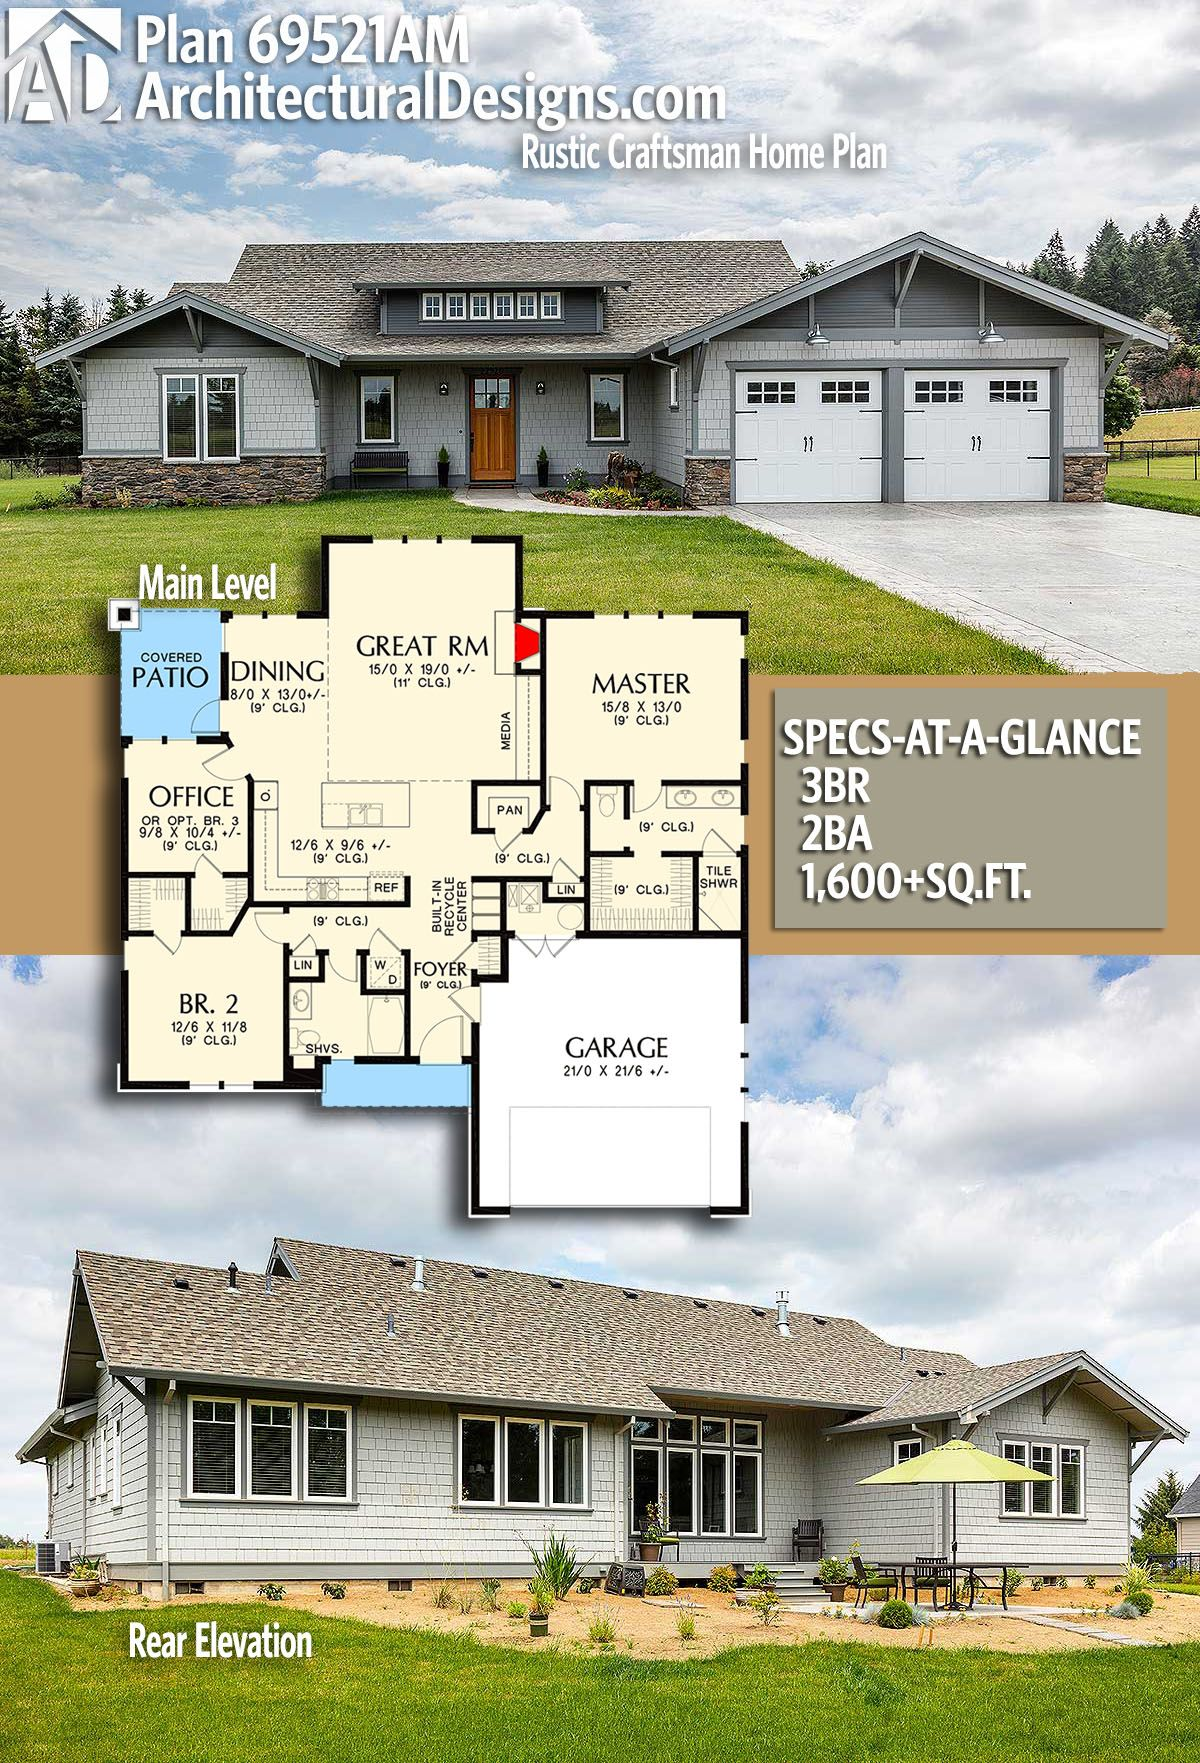 Plan 69521AM: Rustic Craftsman Home Plan | Architectural design ...